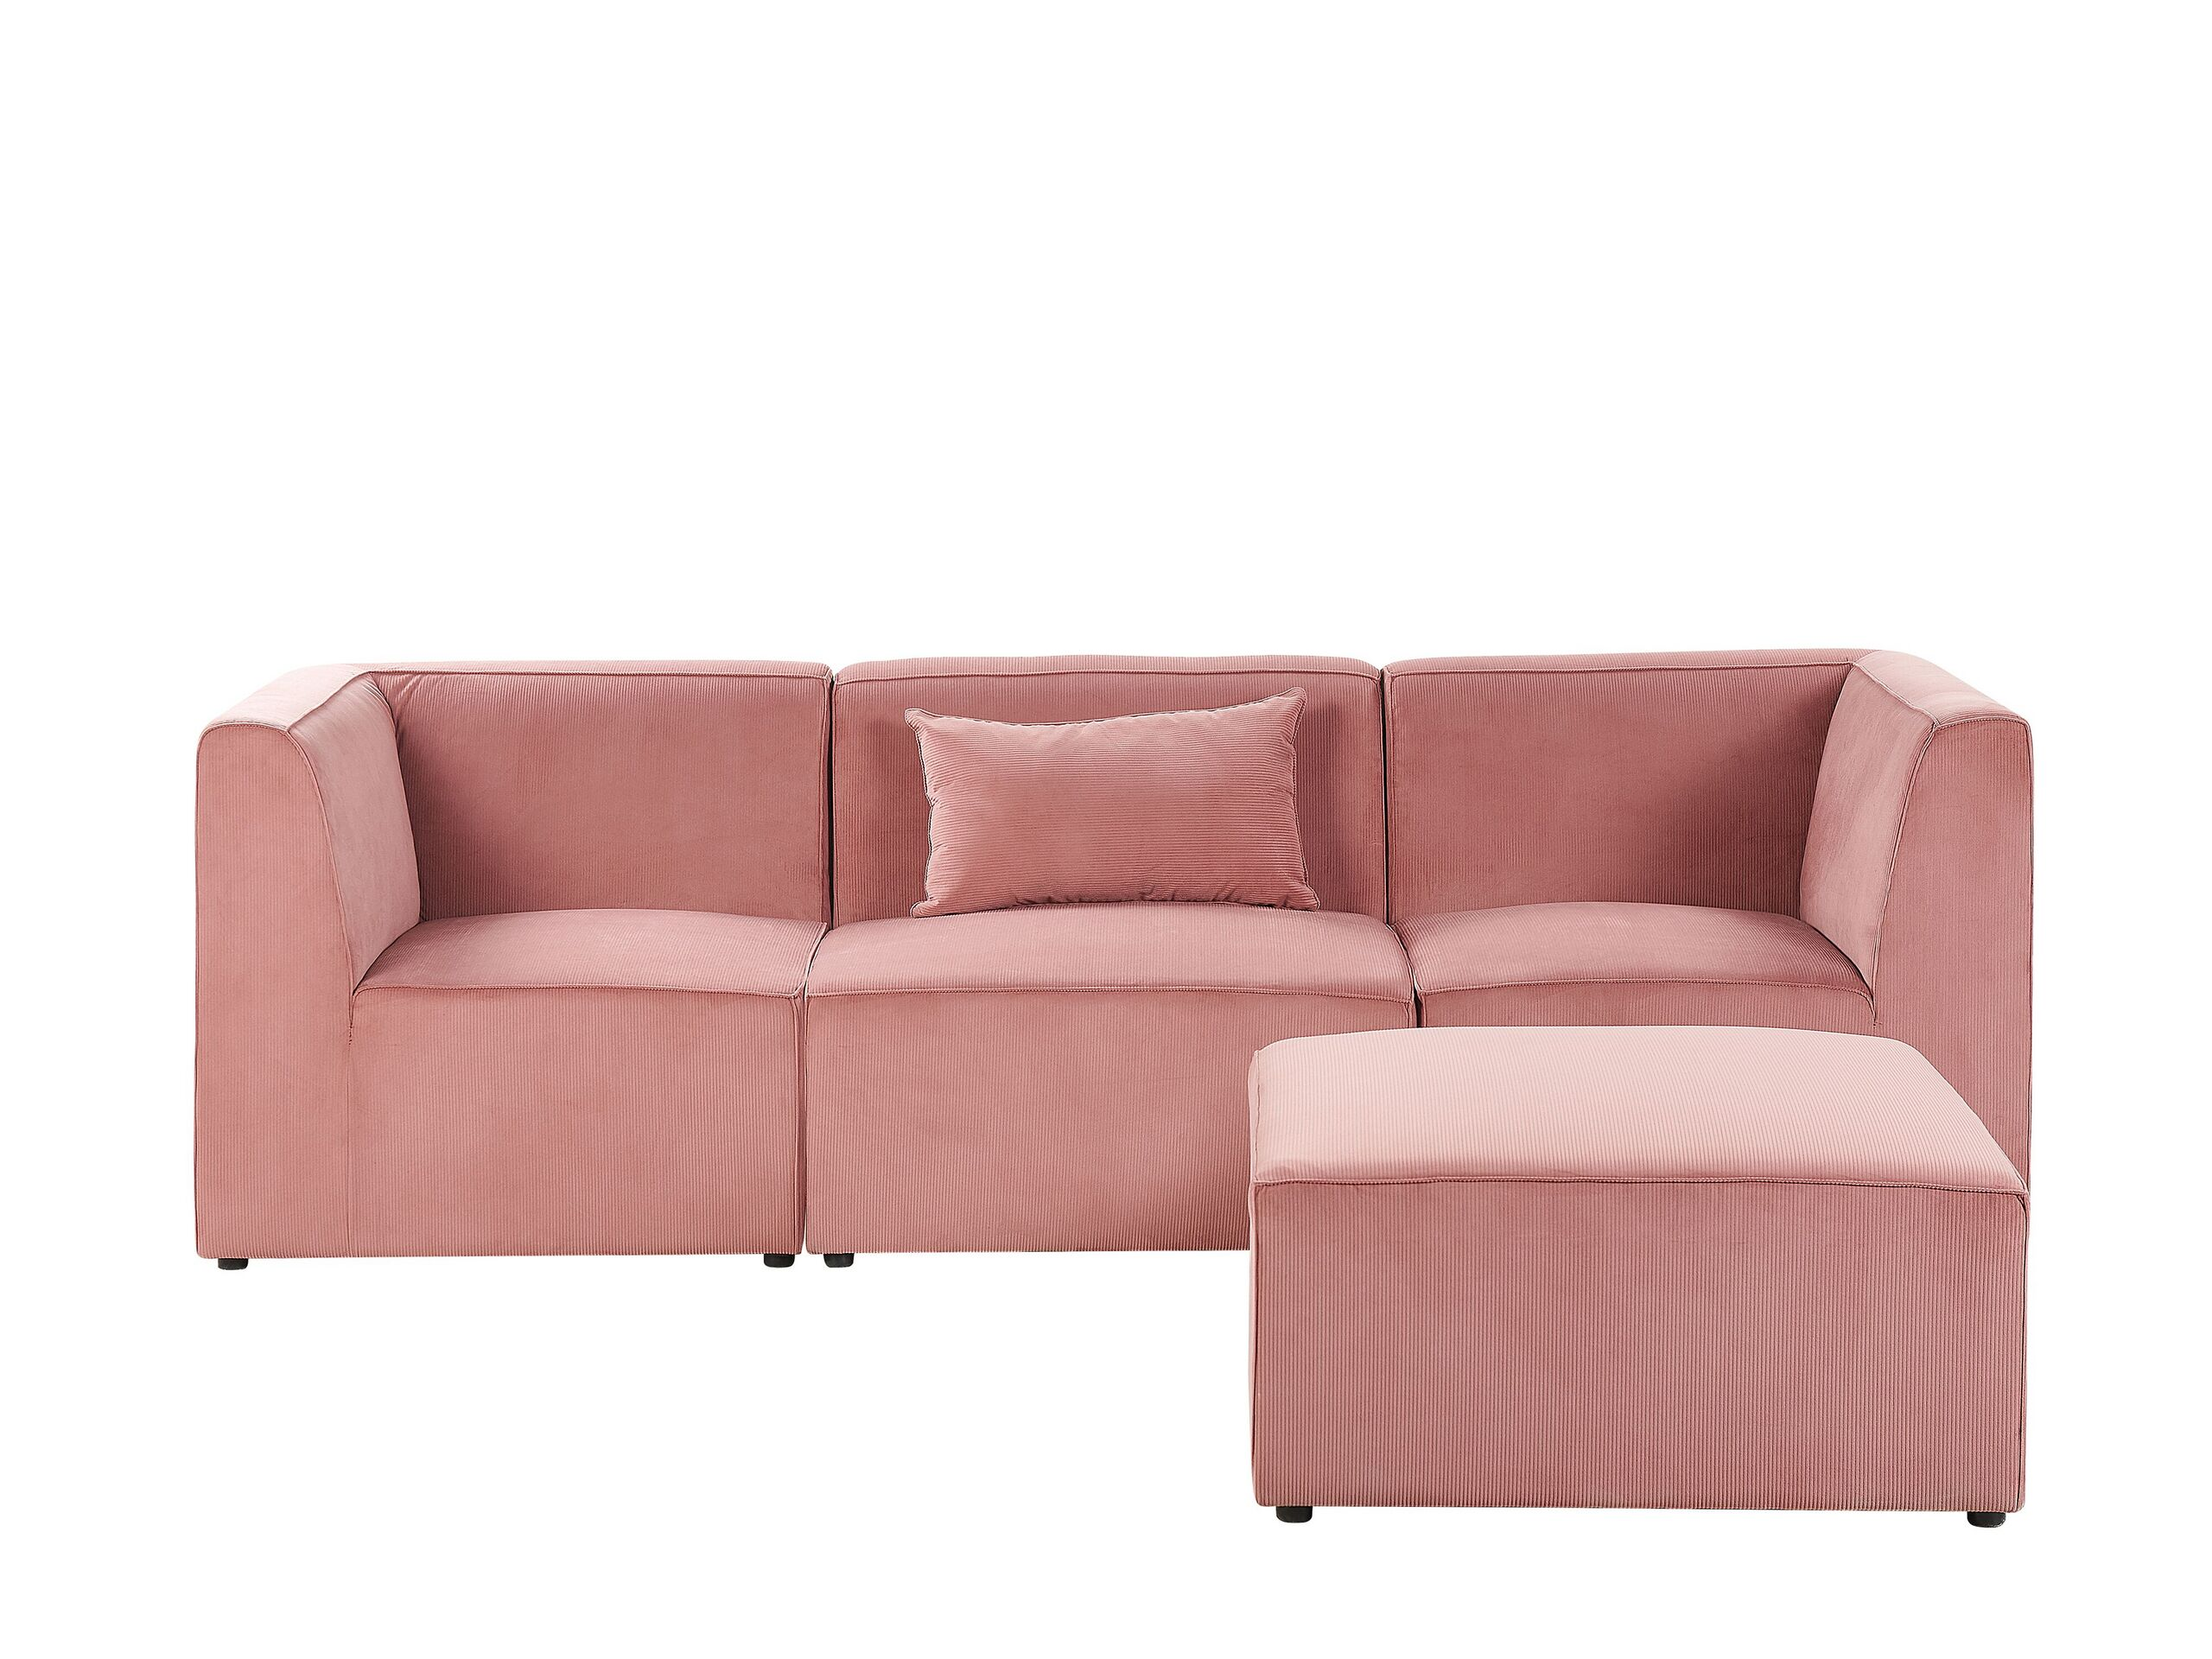 Canapé modulable 3 places Rose Velours Moderne Confort